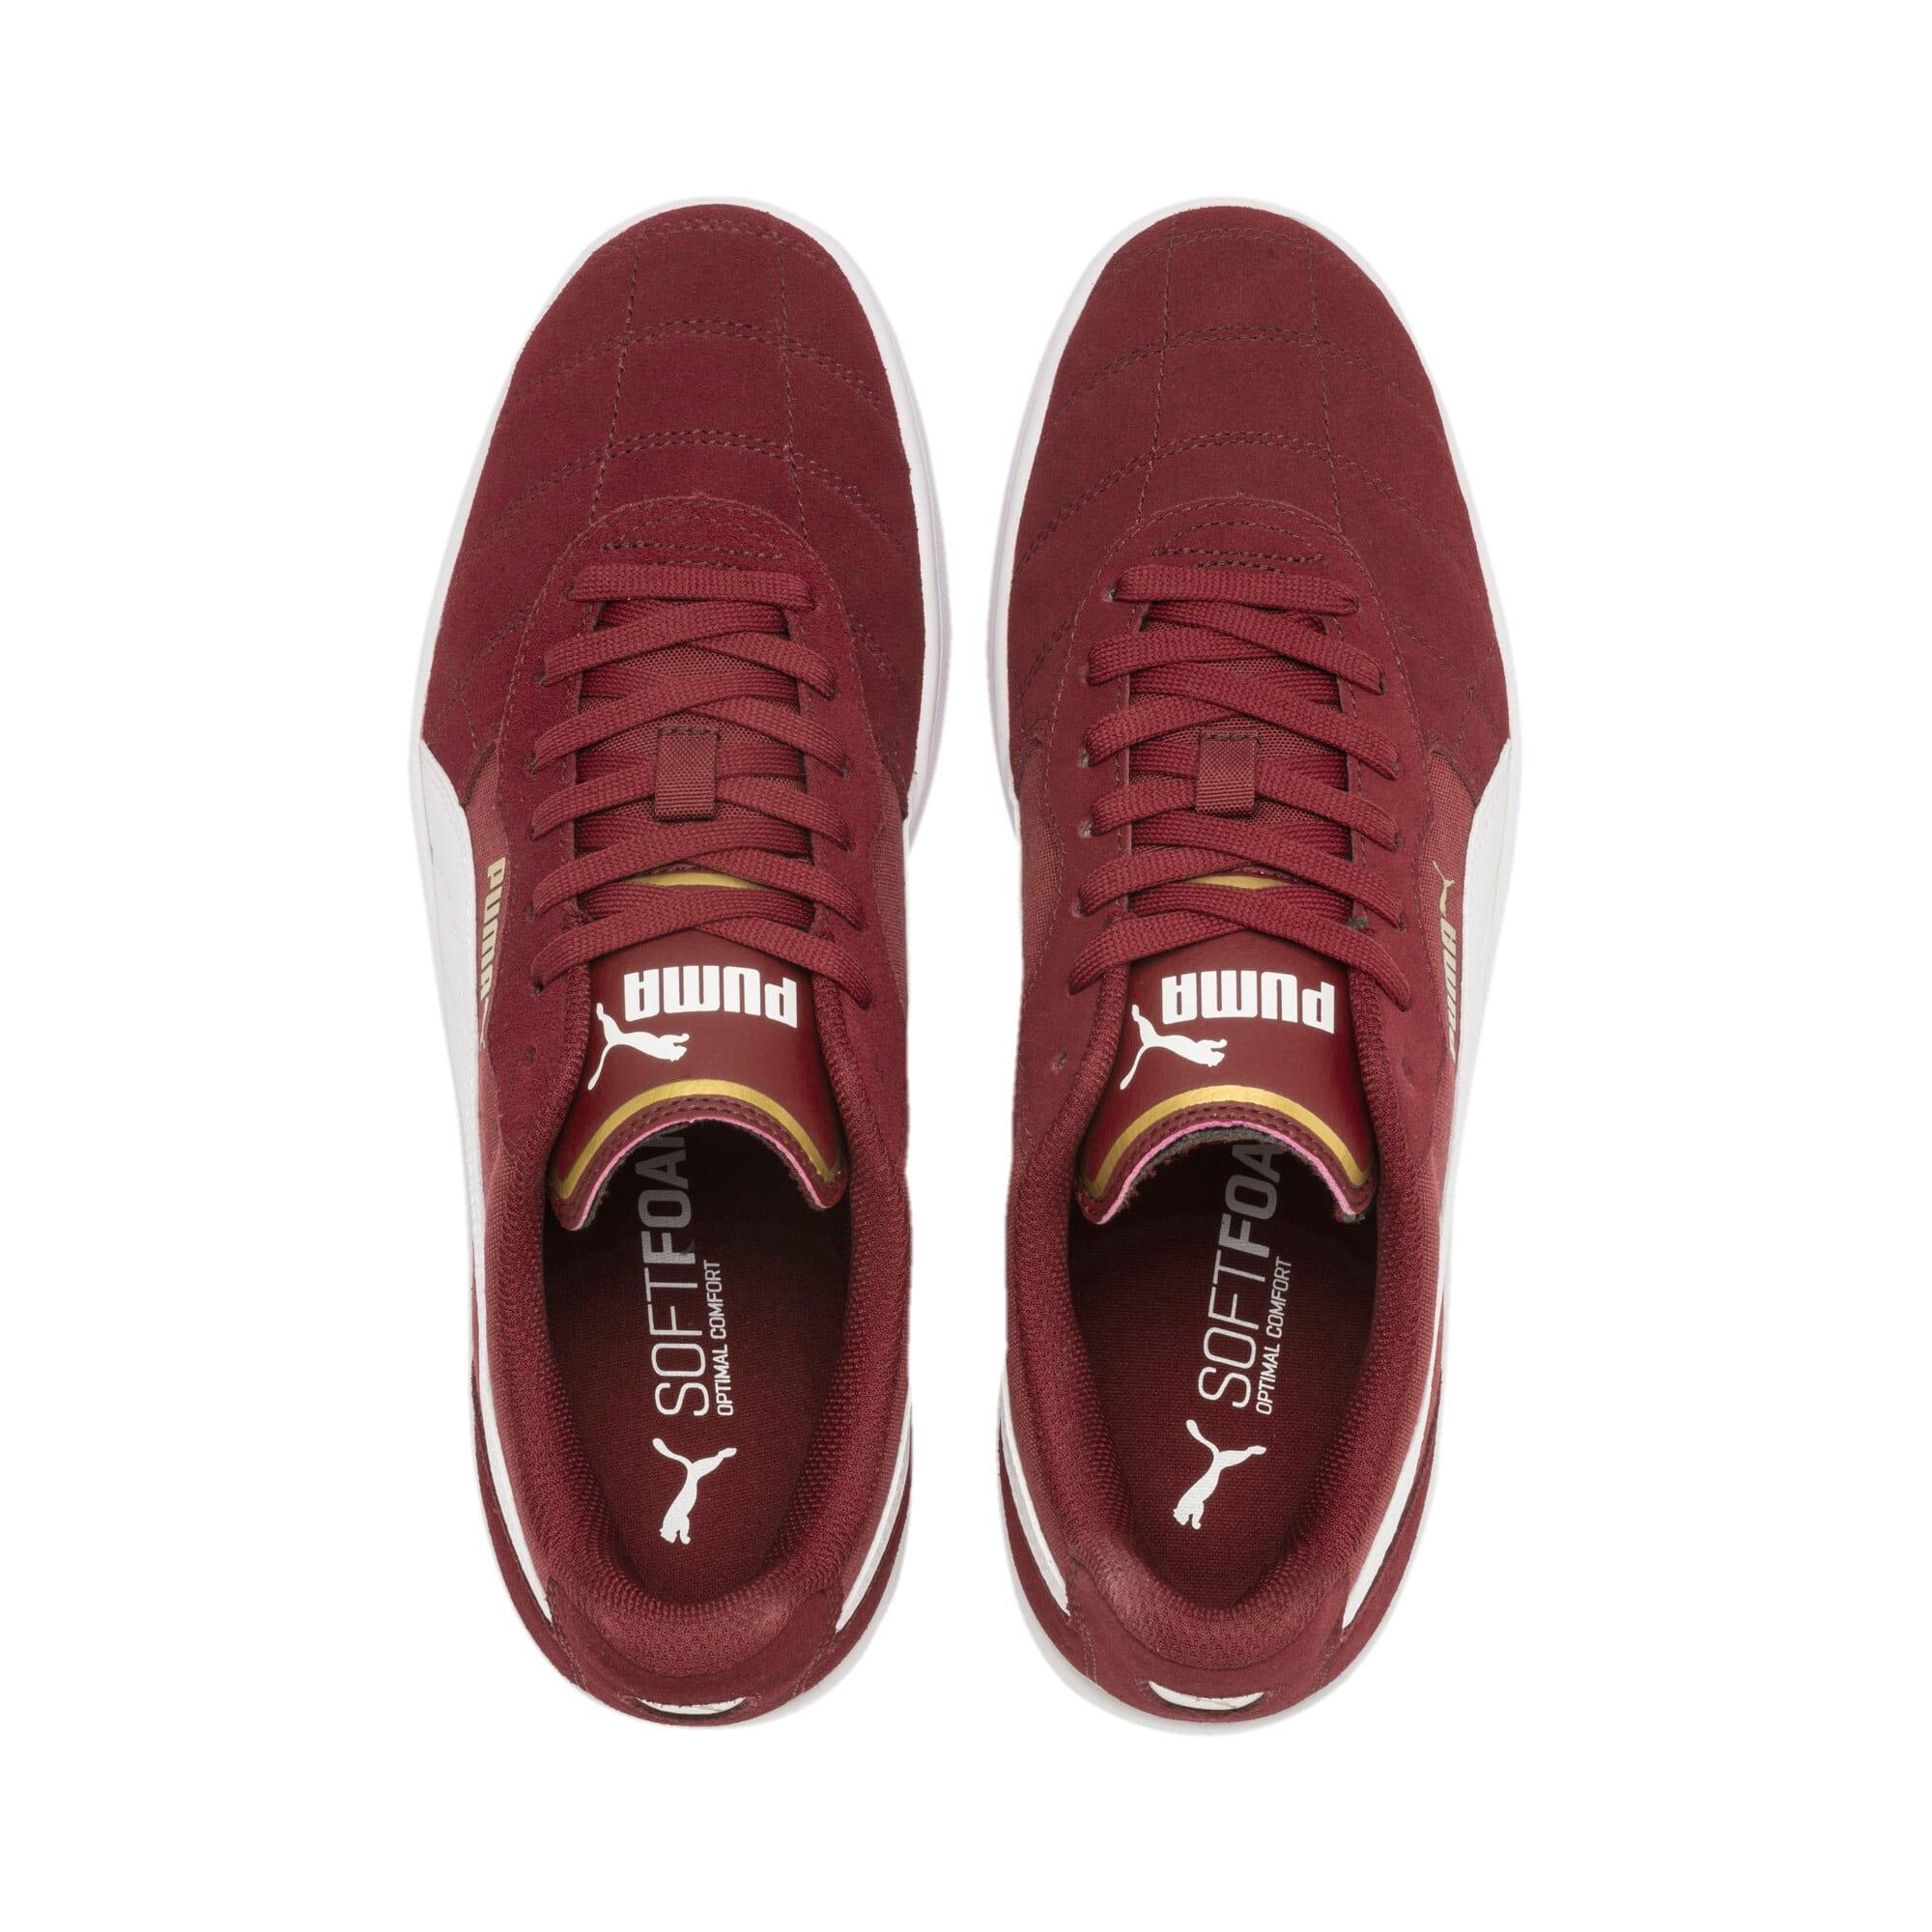 Thumbnail 7 of Astro Kick Sneakers, Rhubarb-Puma White-Gold, medium